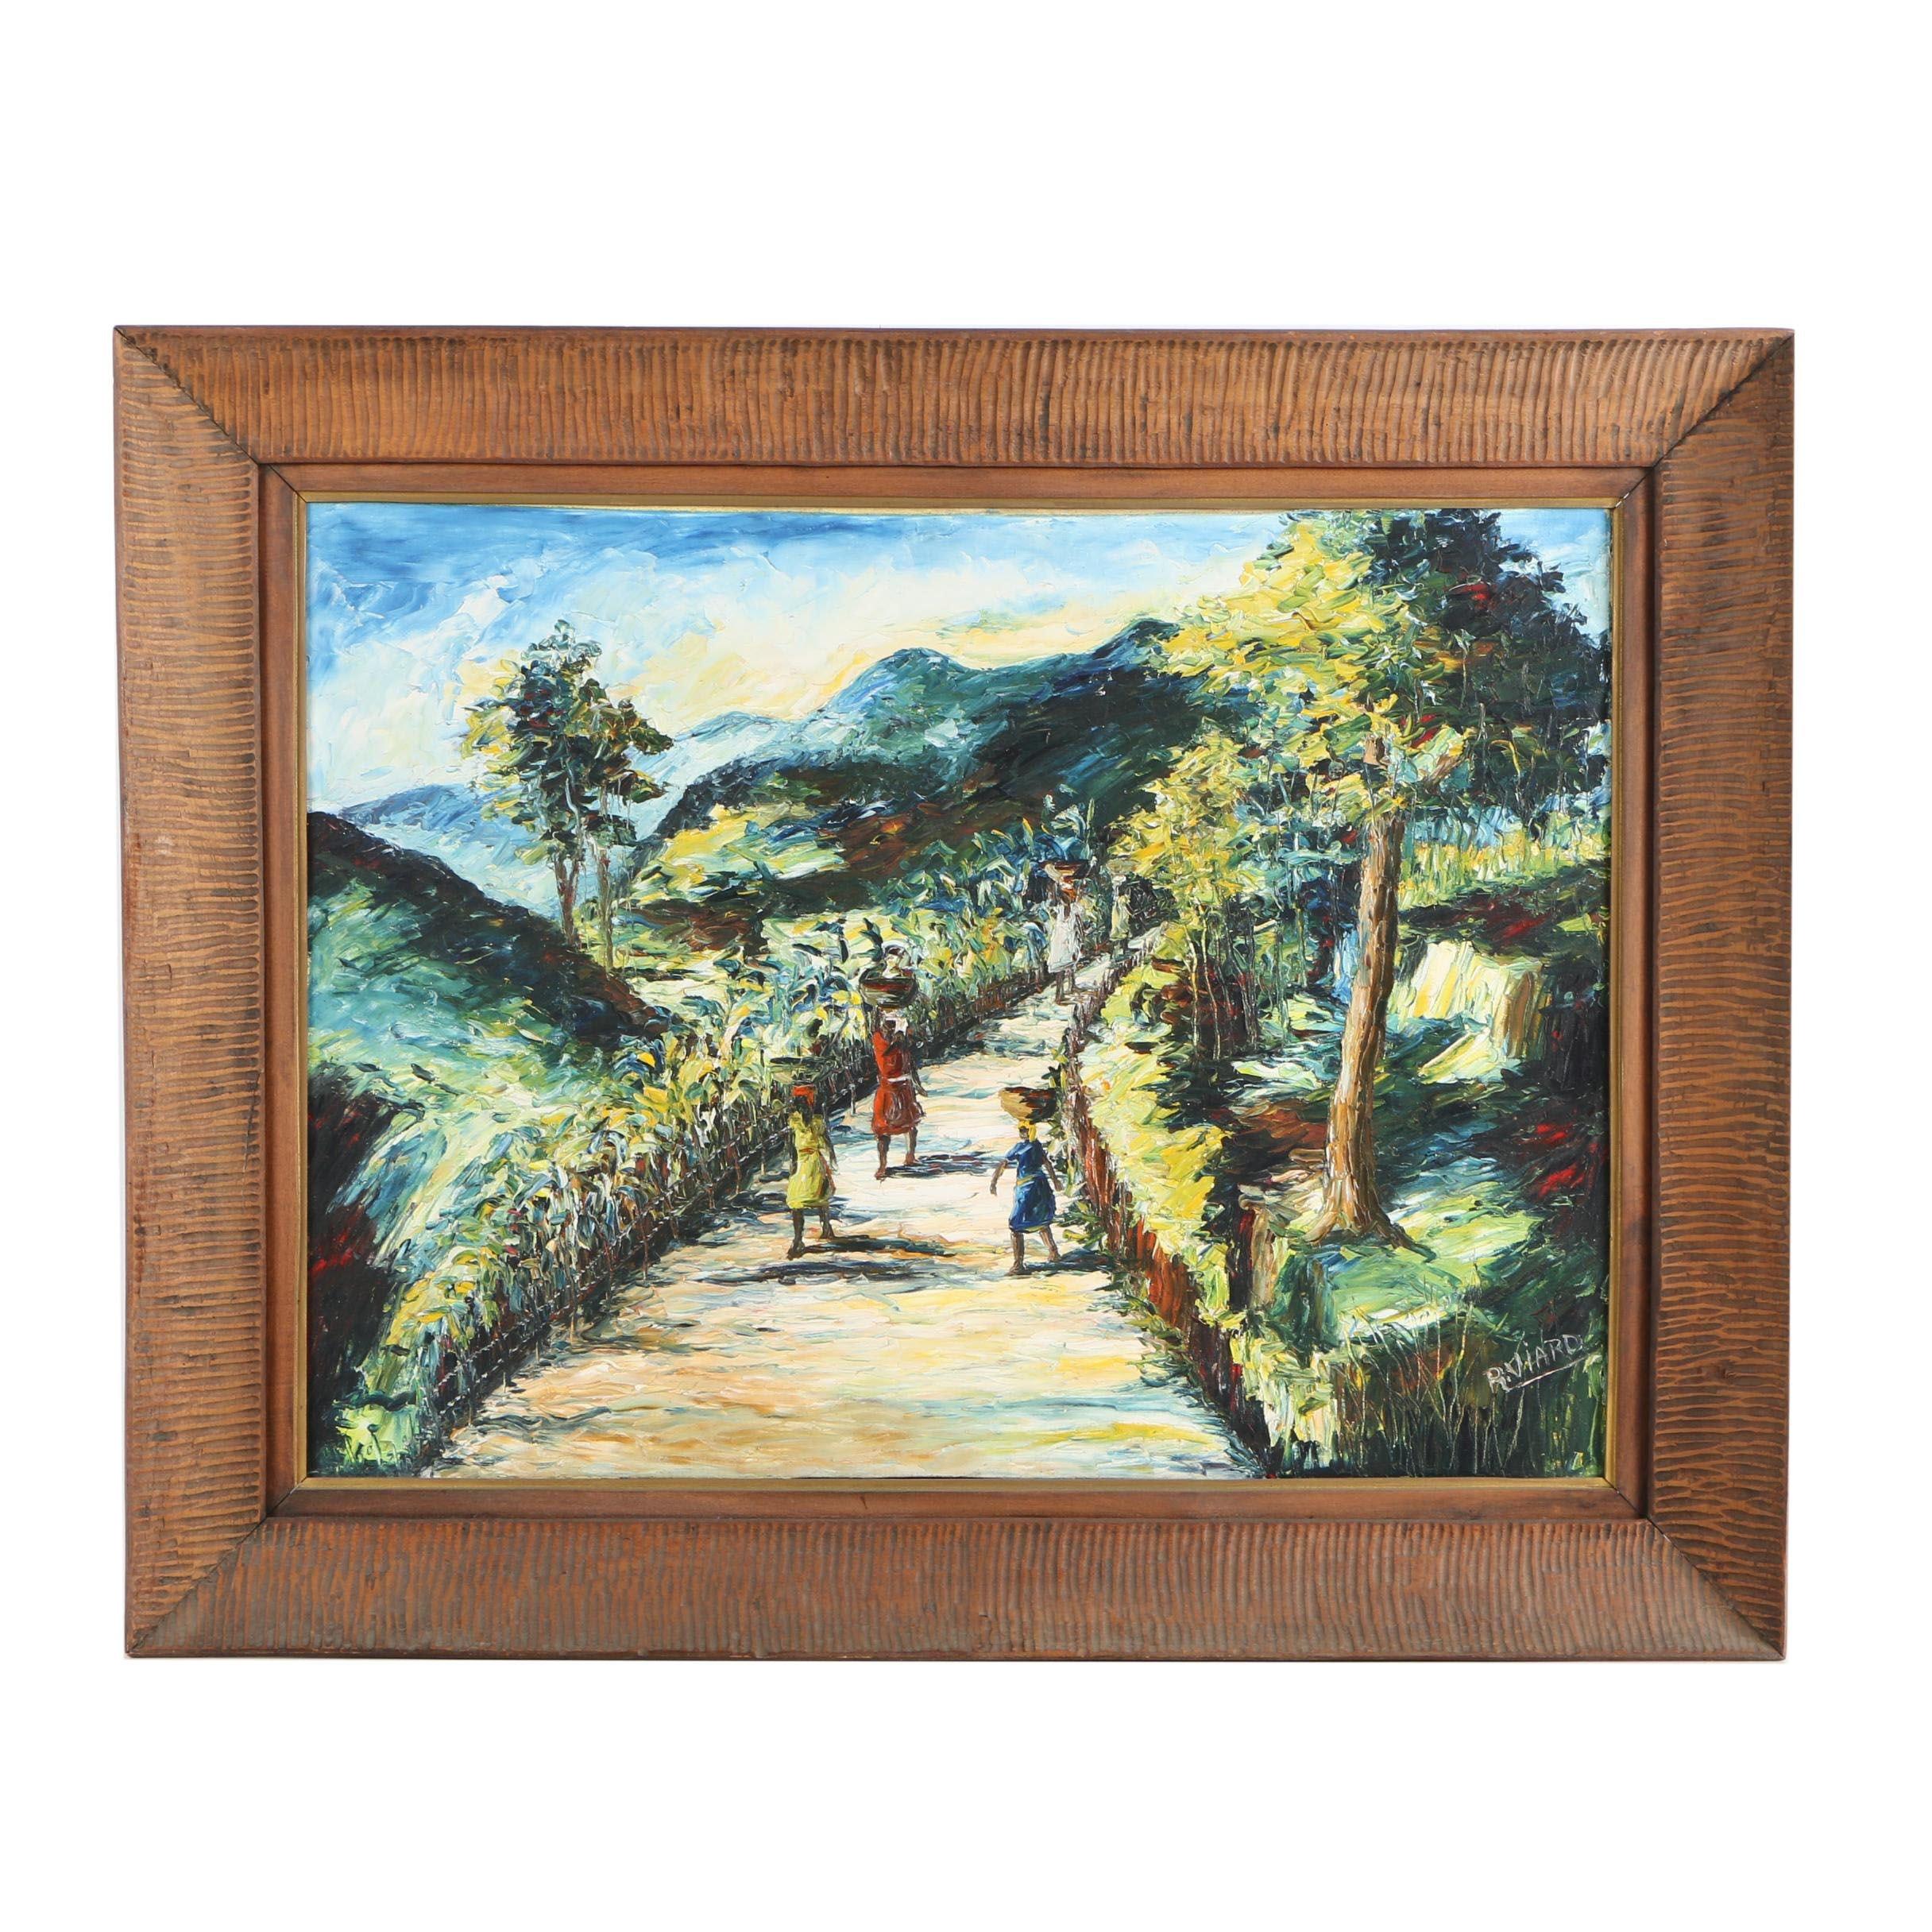 Raoul Viard Oil Painting